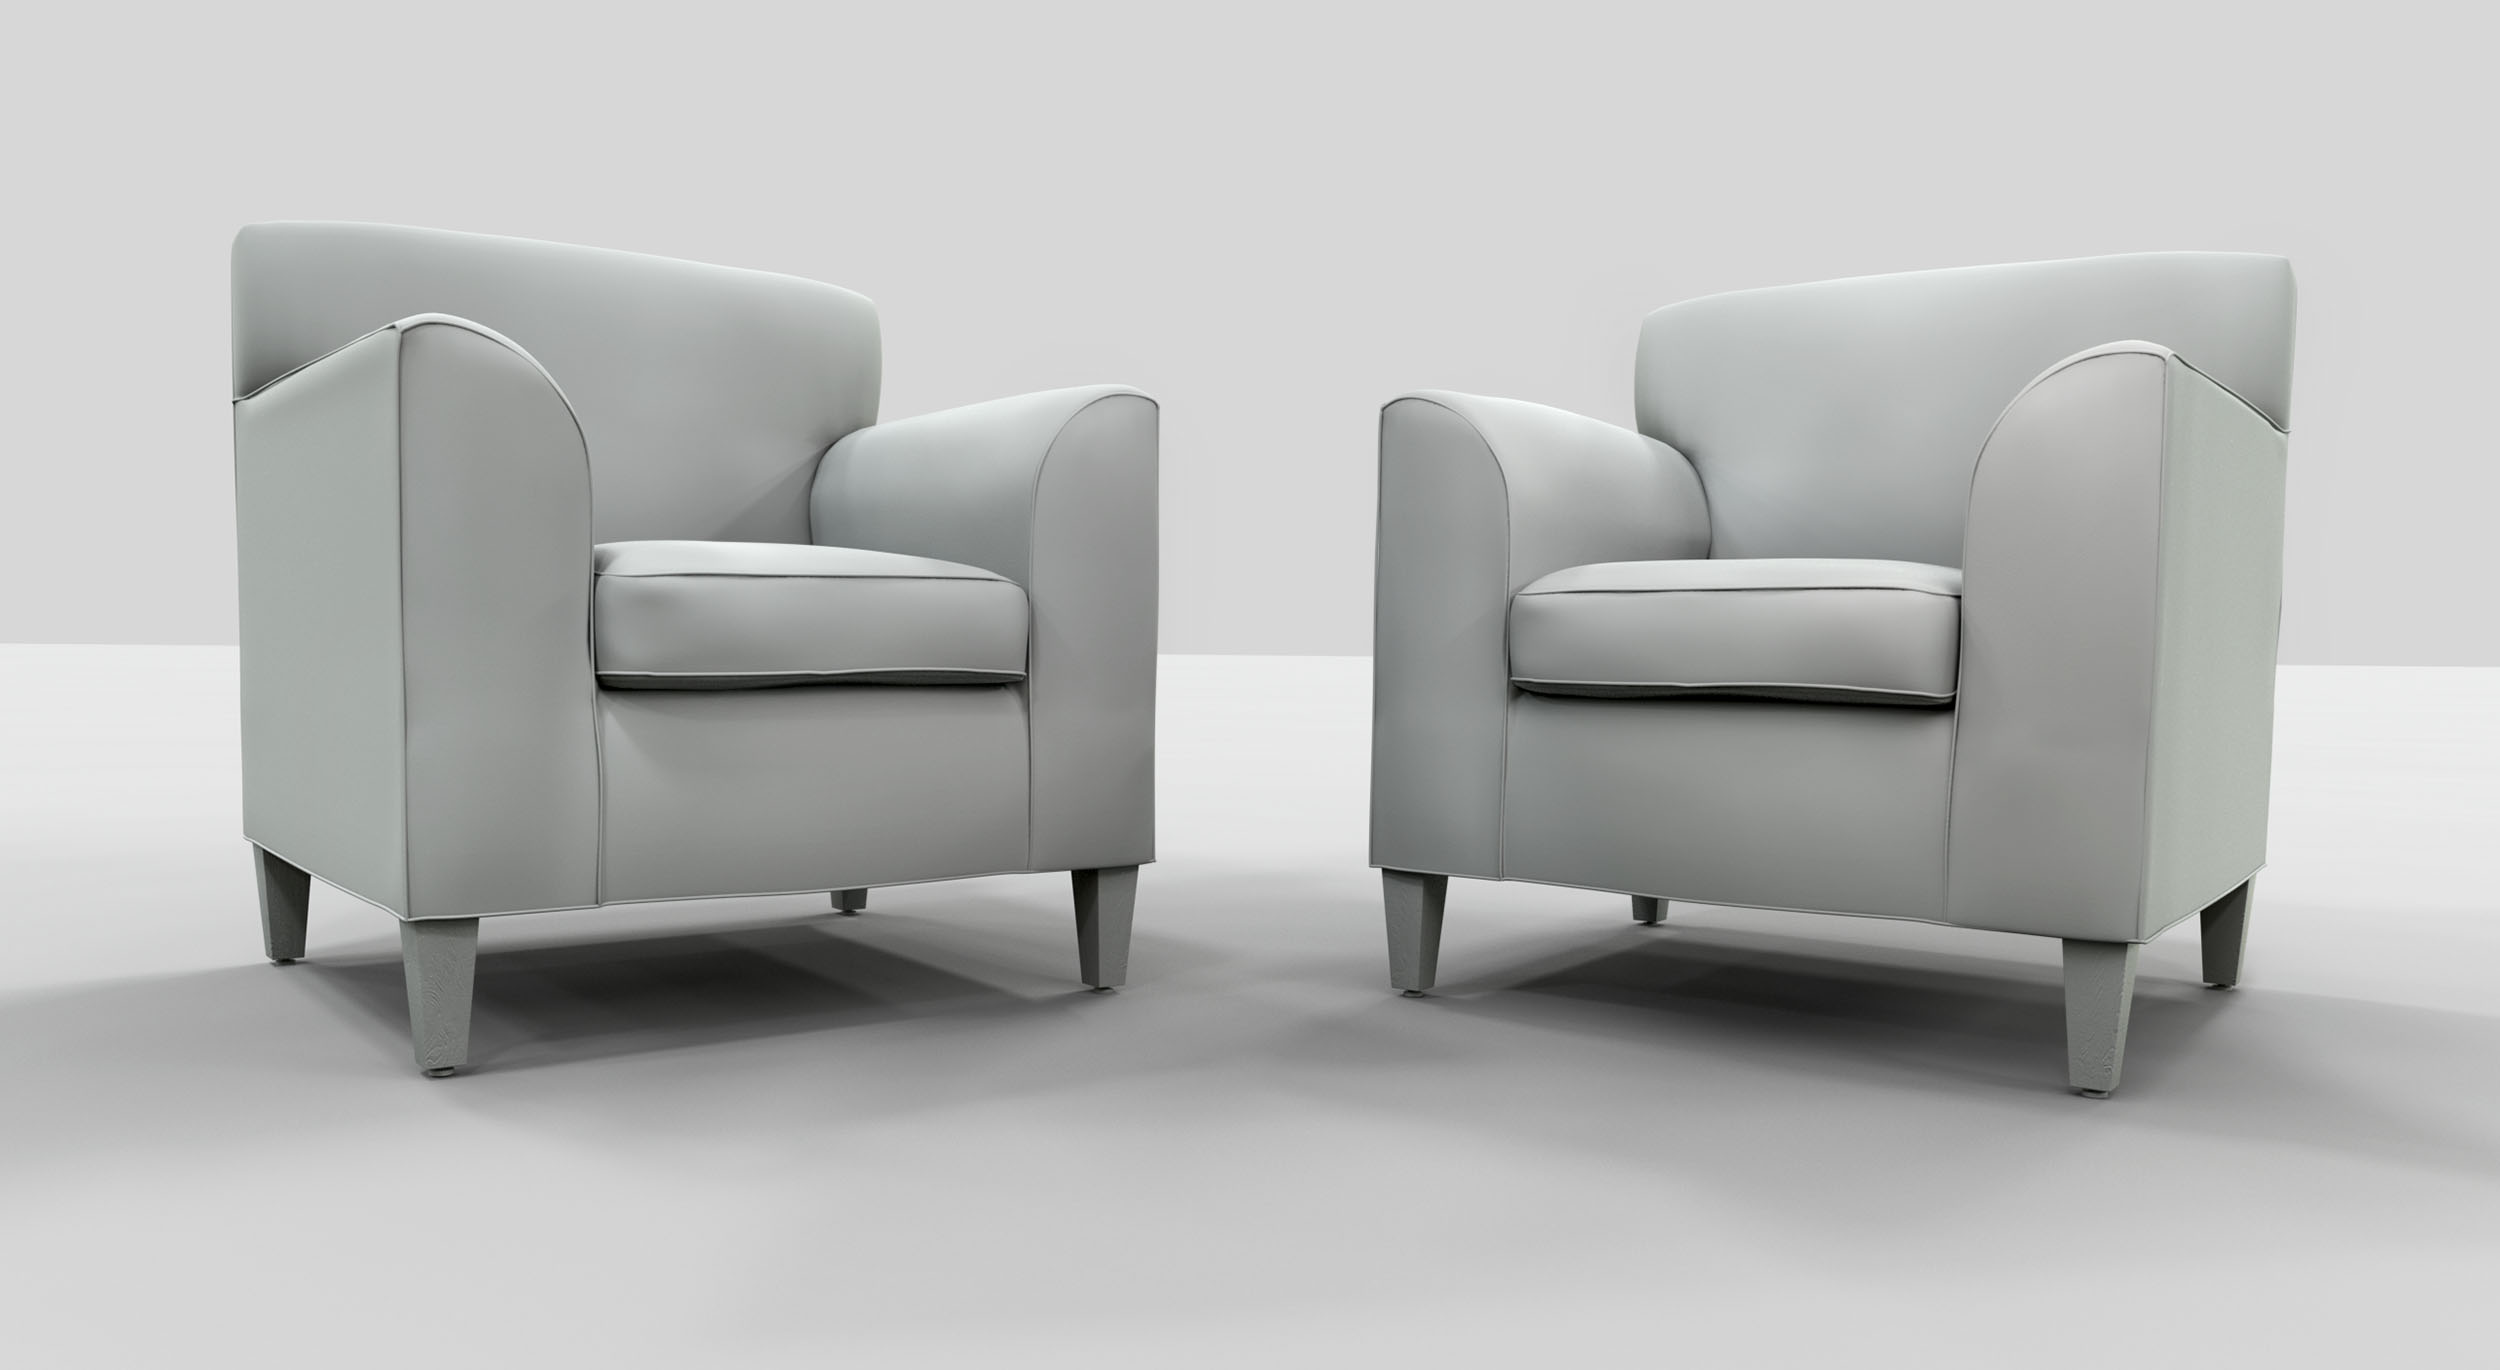 chairs_clay.jpg